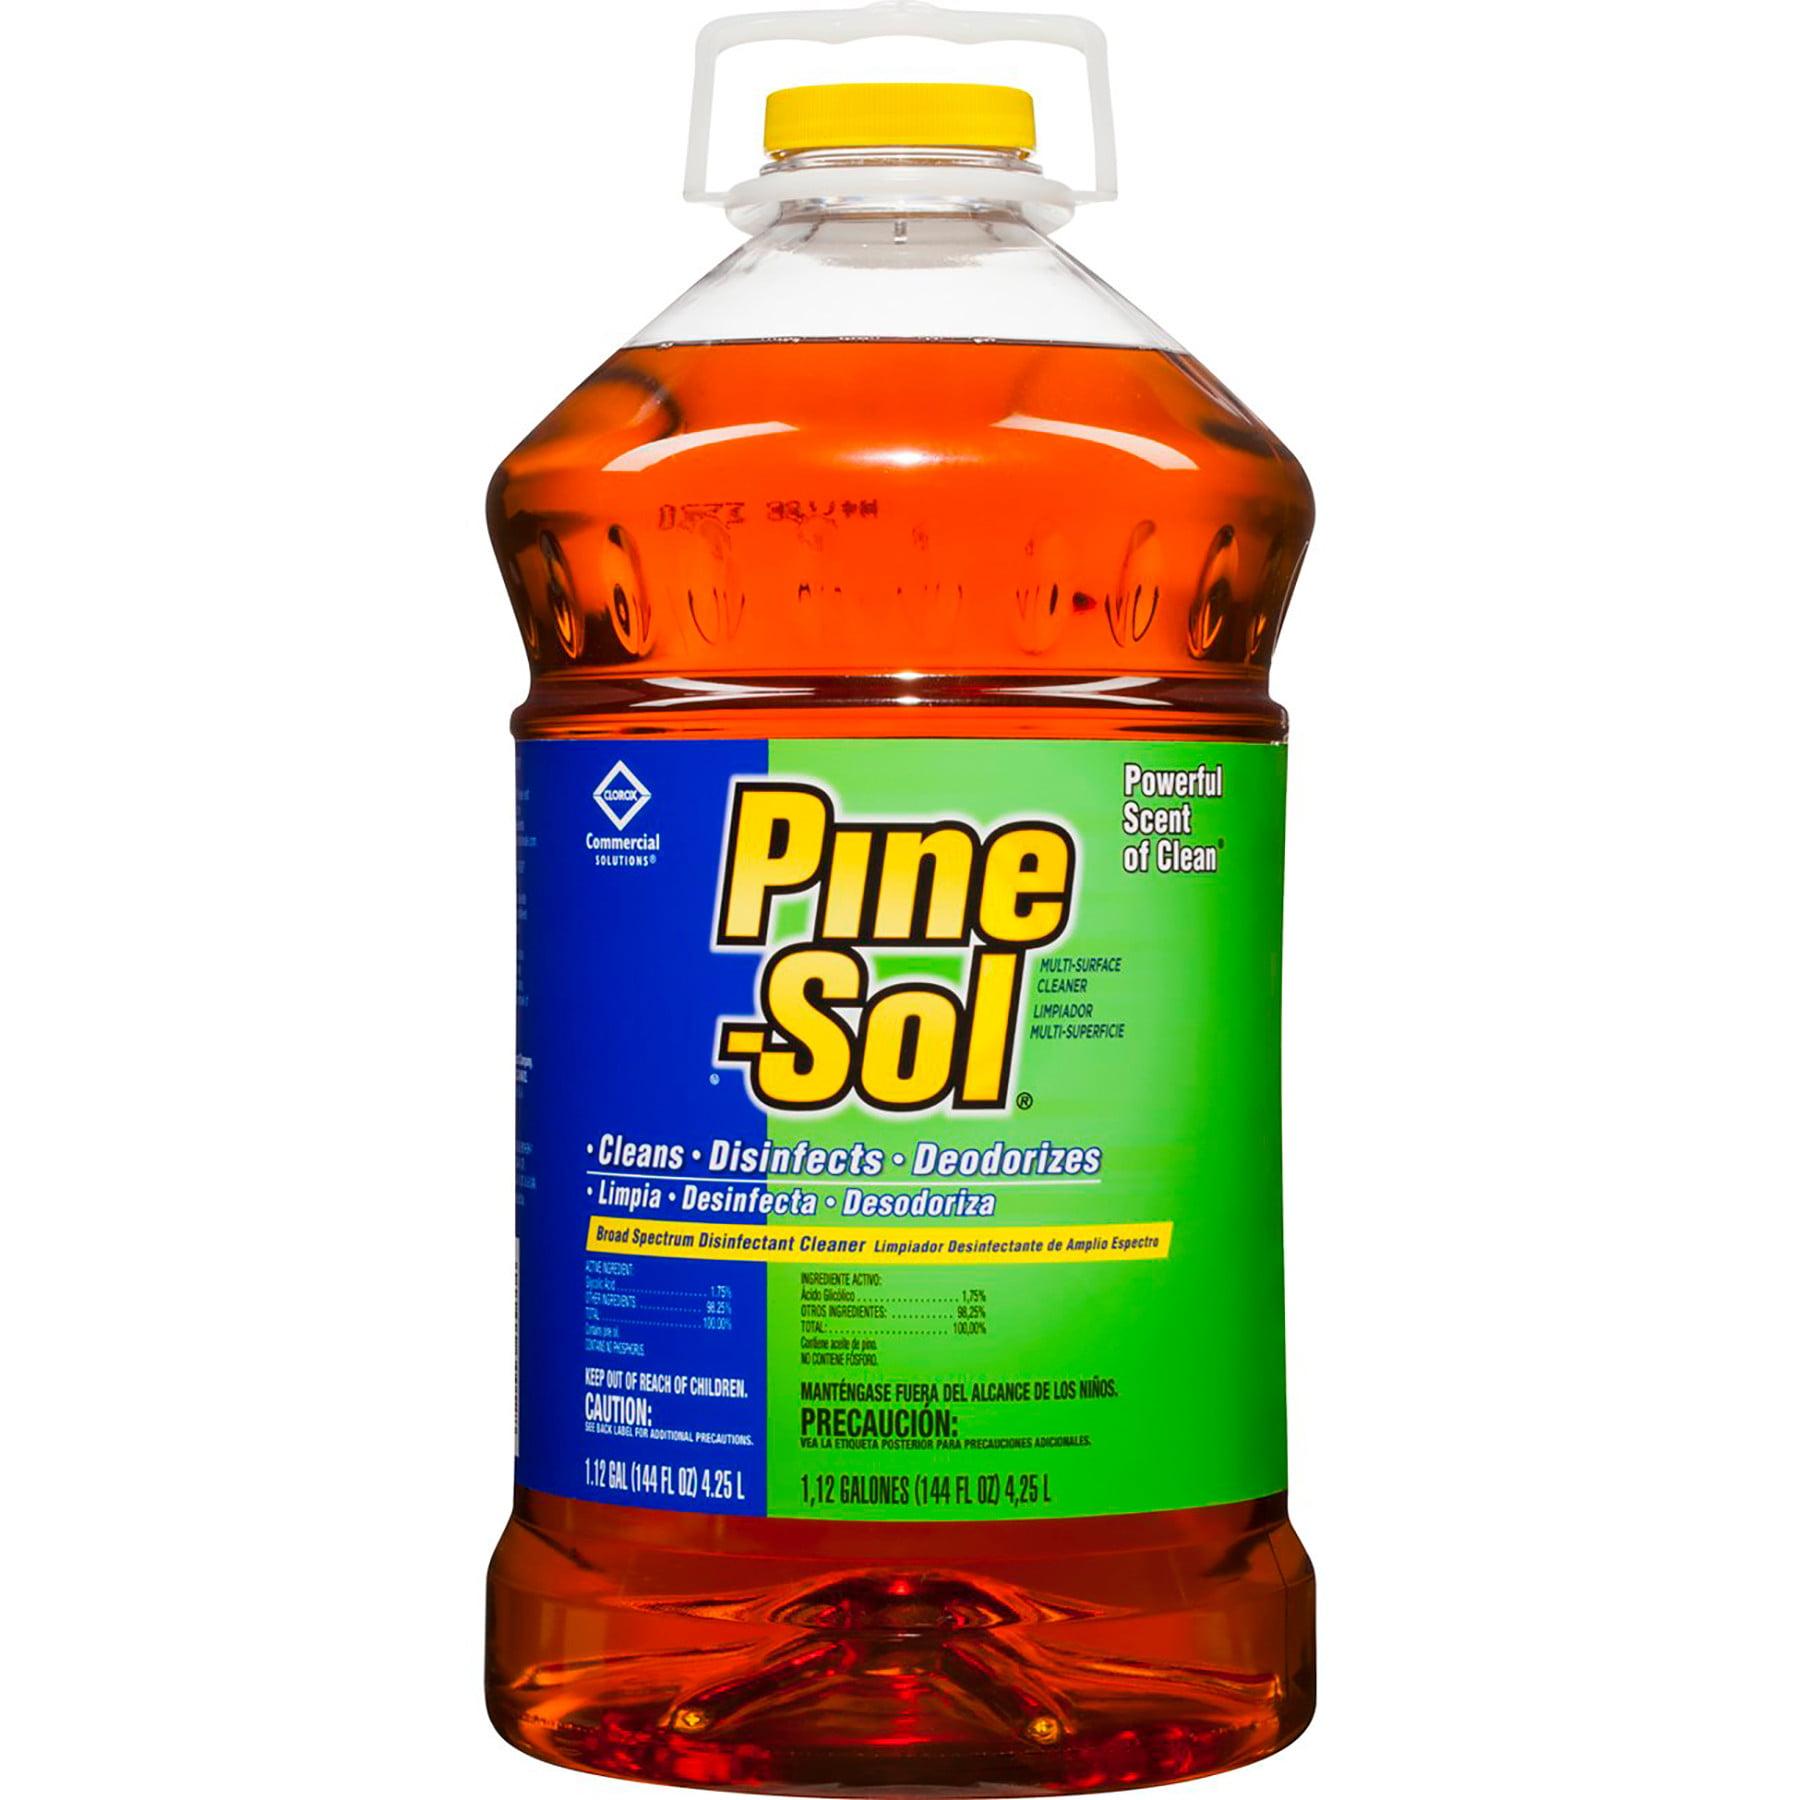 Pine-Sol Multi-Surface Cleaner, Pine, 144oz Bottle